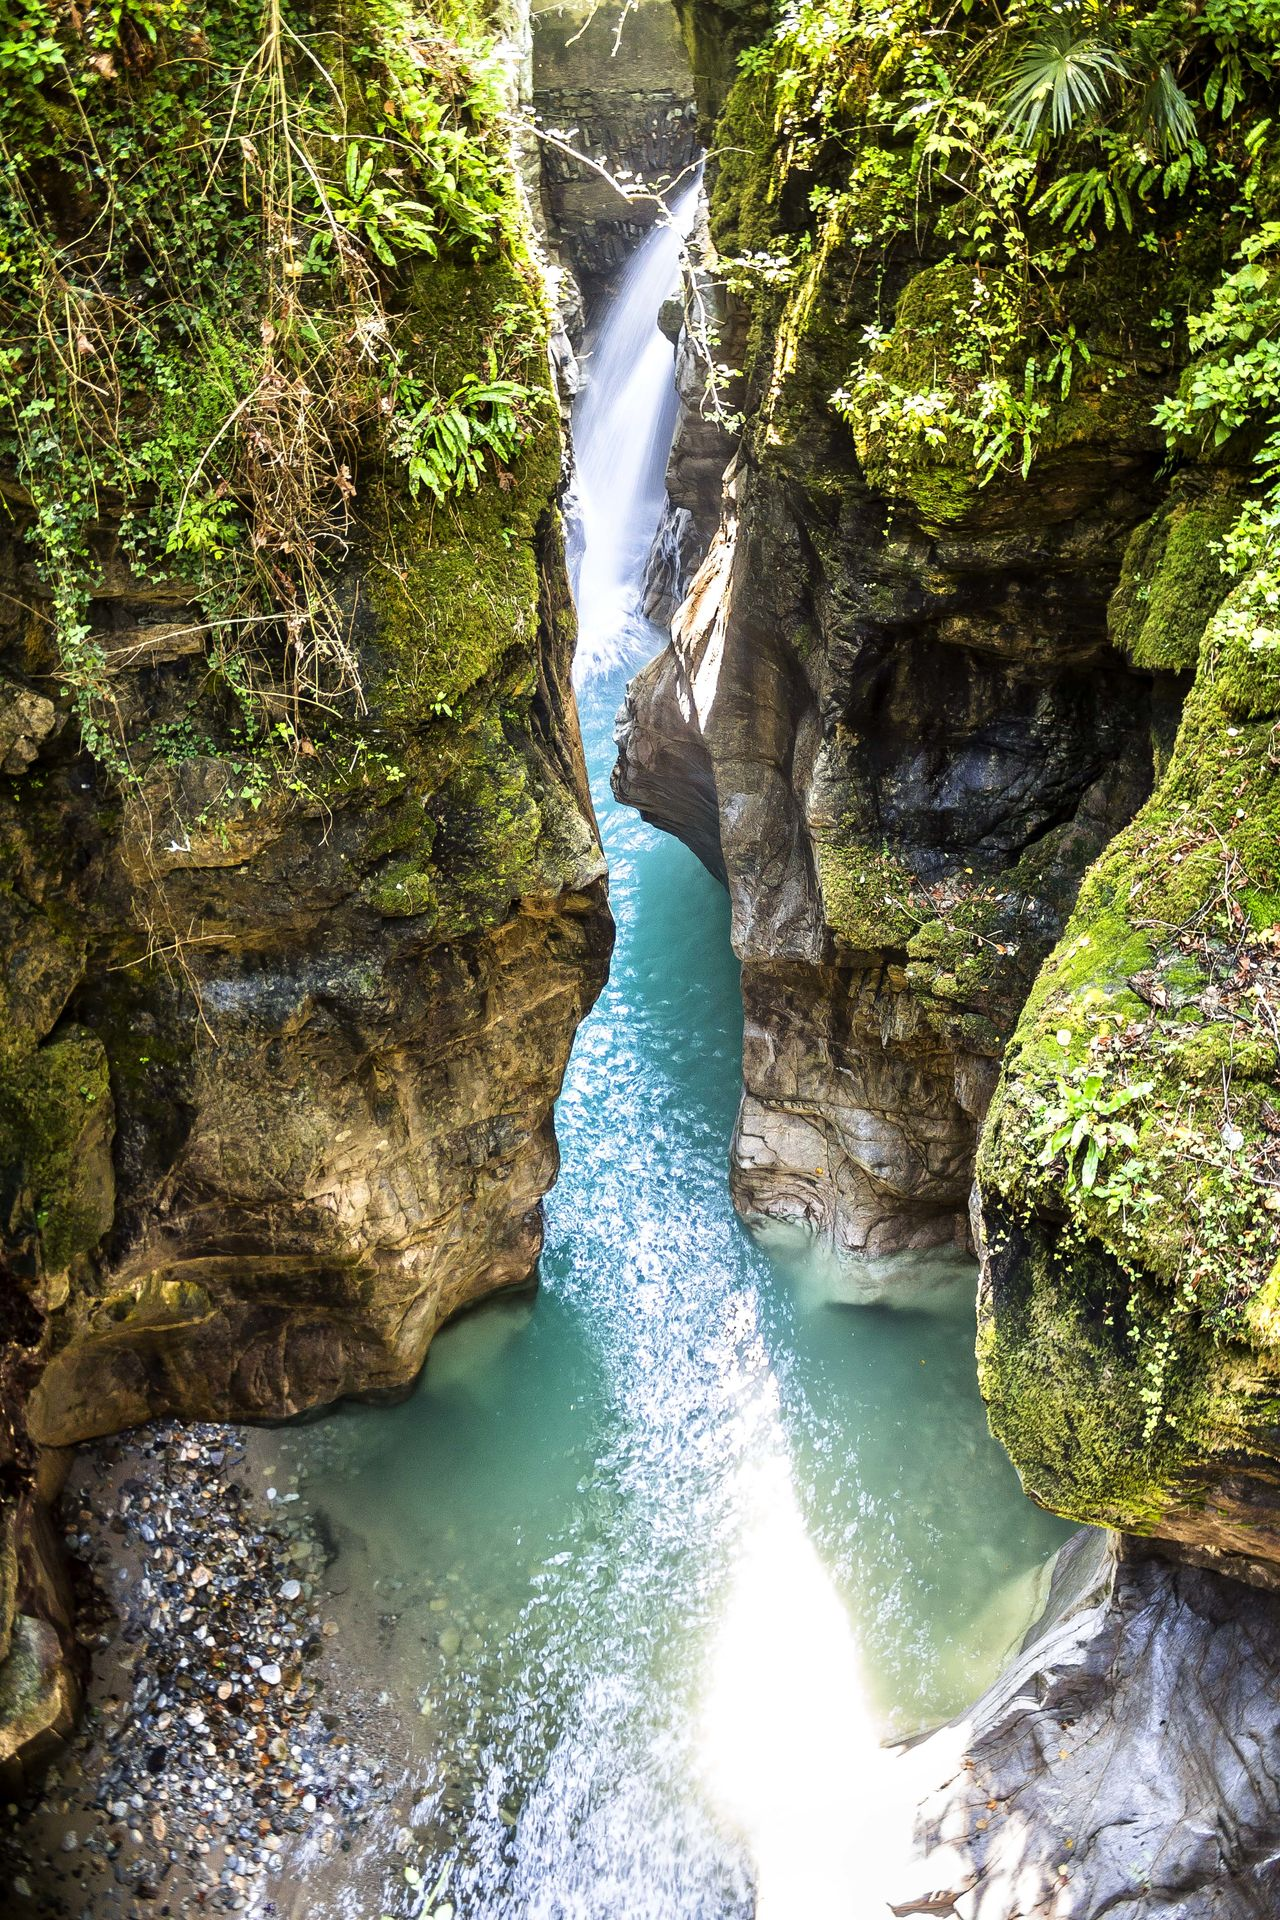 Bellano The Week On EyeEm Beauty In Nature Day Italy Motion Nature No People Orrido Orrido Di Bellano Outdoors Rock - Object Water Waterfall